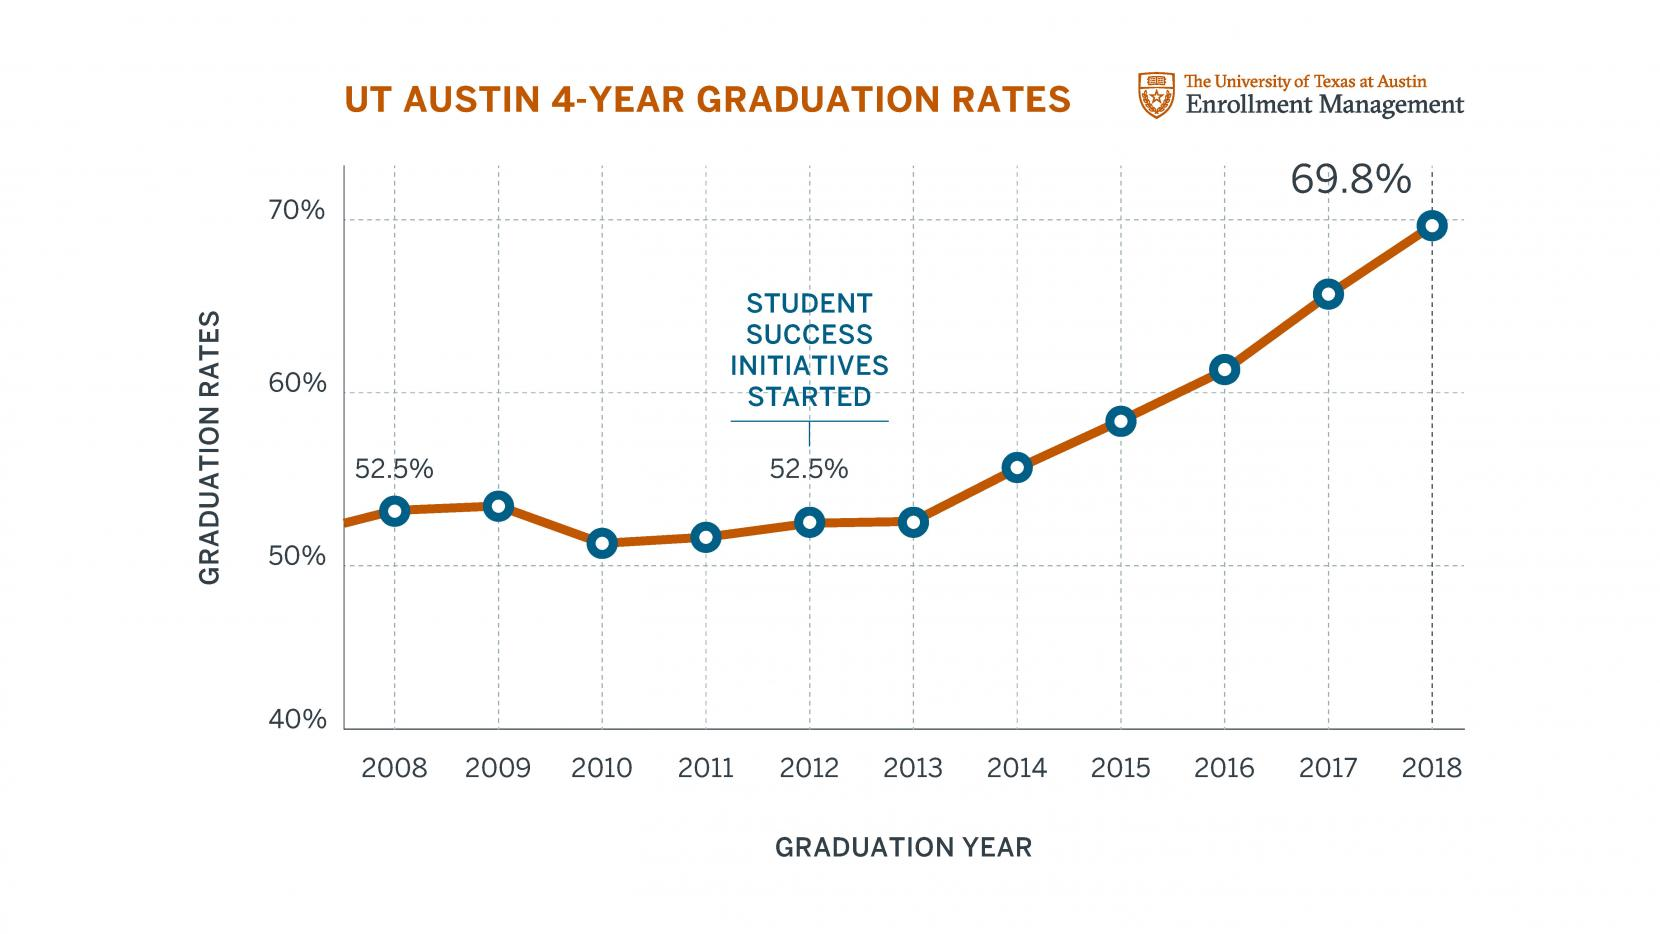 UT Austin Records Its Highest Four-Year Graduation Rate - UT